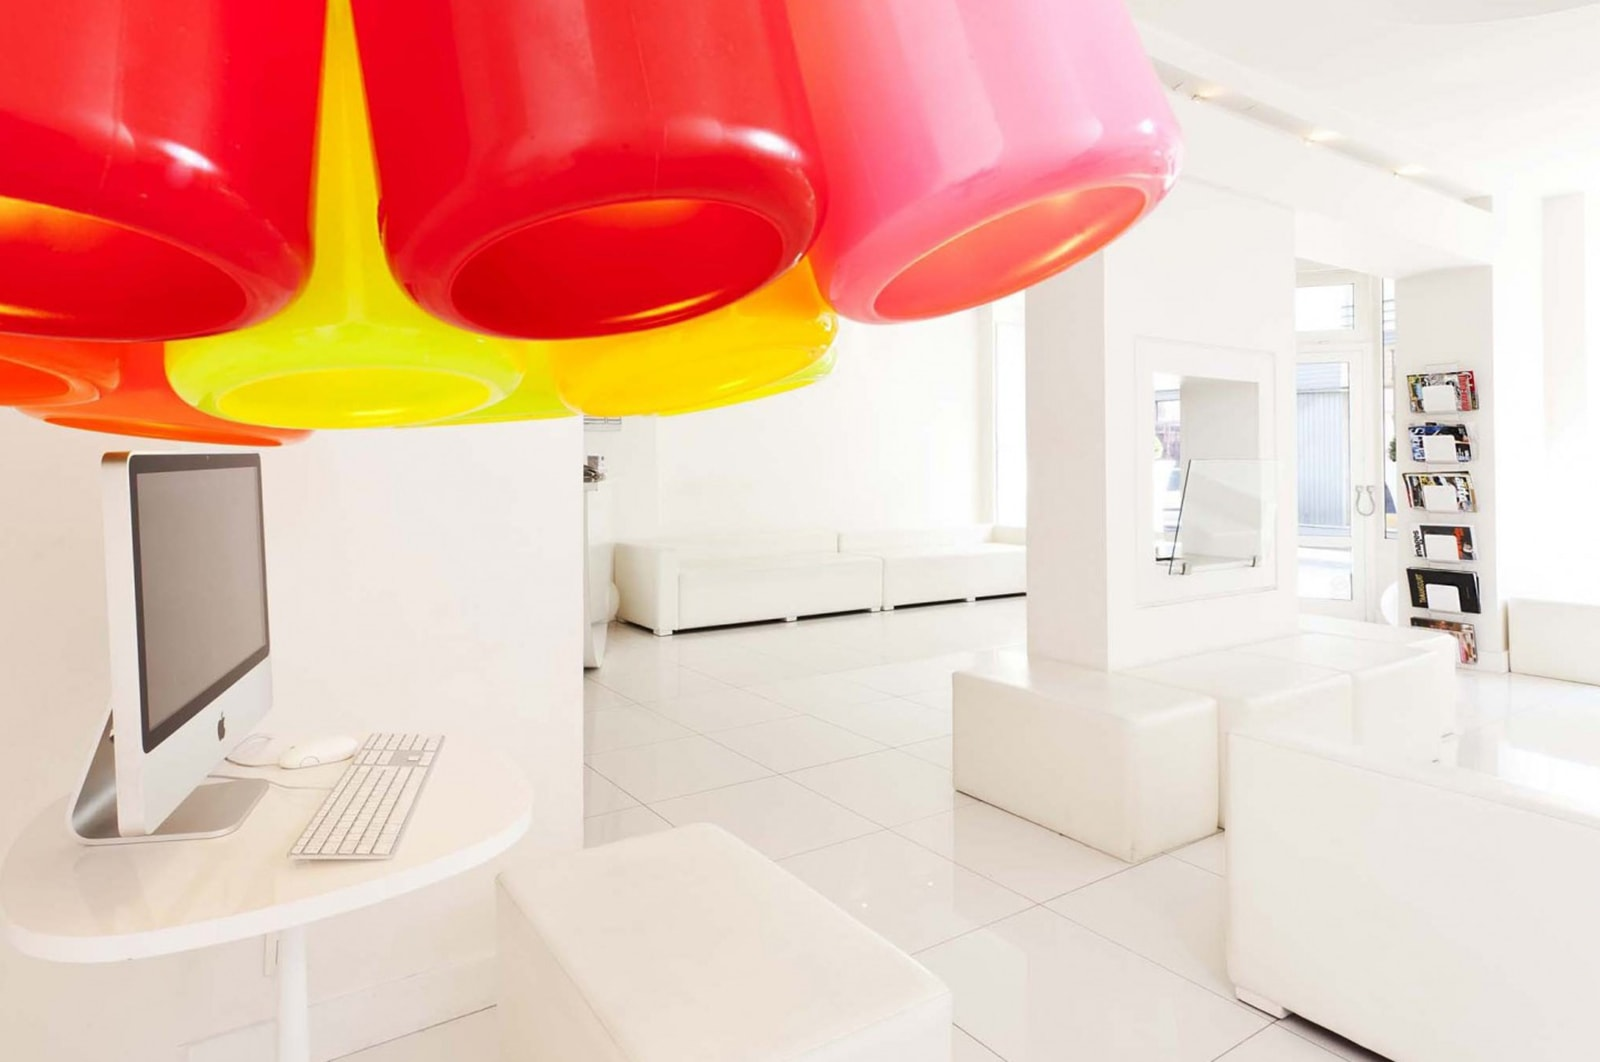 Color Design Hotel Paris Gare De Lyon Sito Official